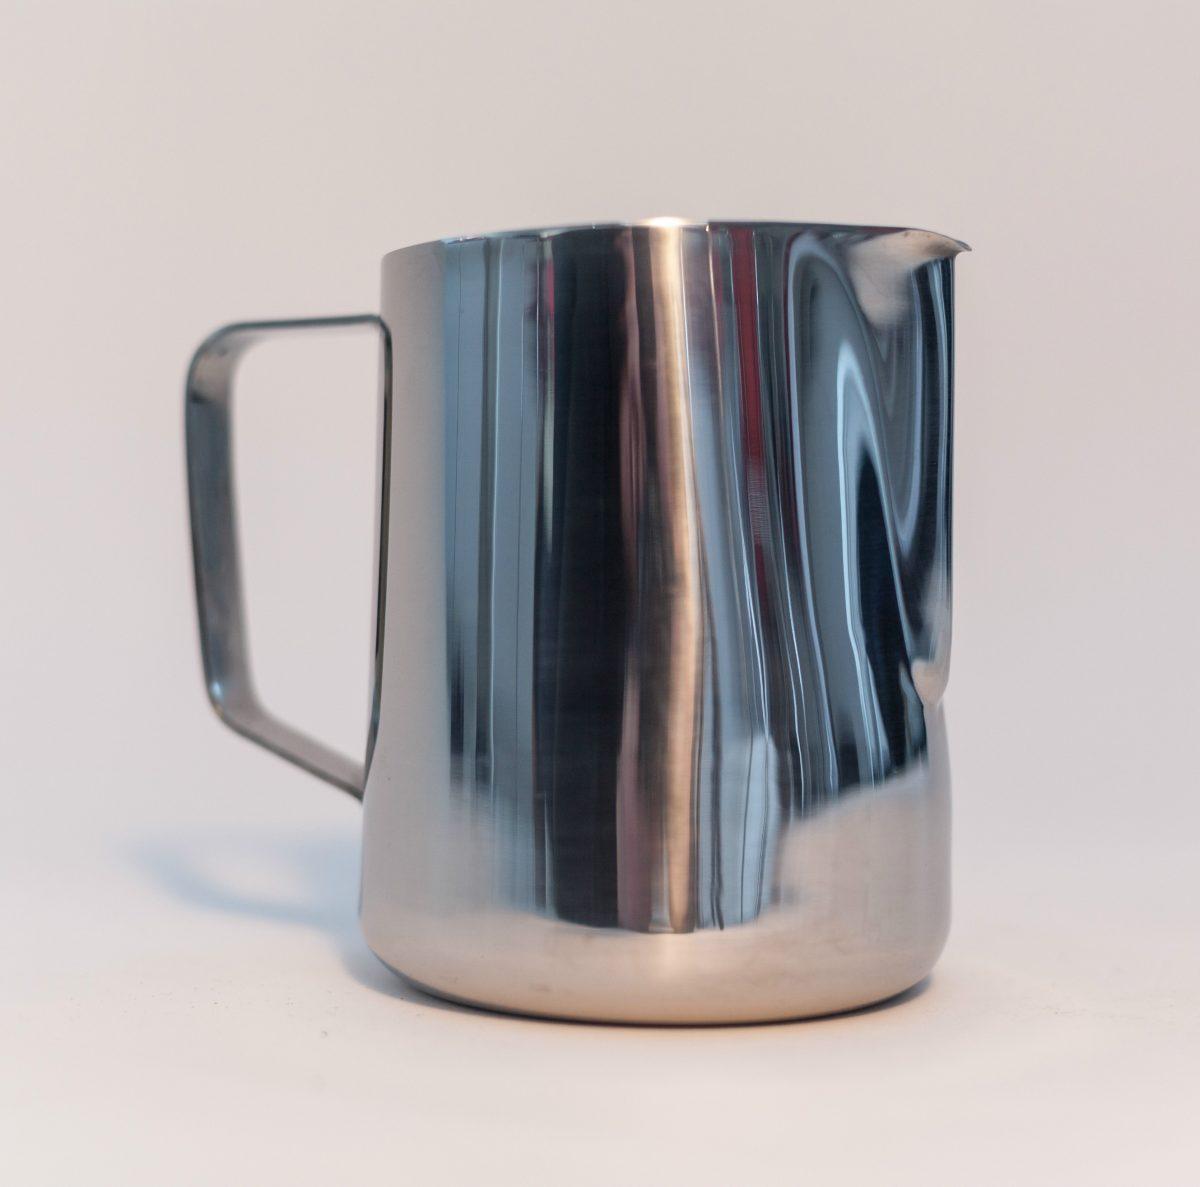 Watermark: Milk foaming jug 1 litre